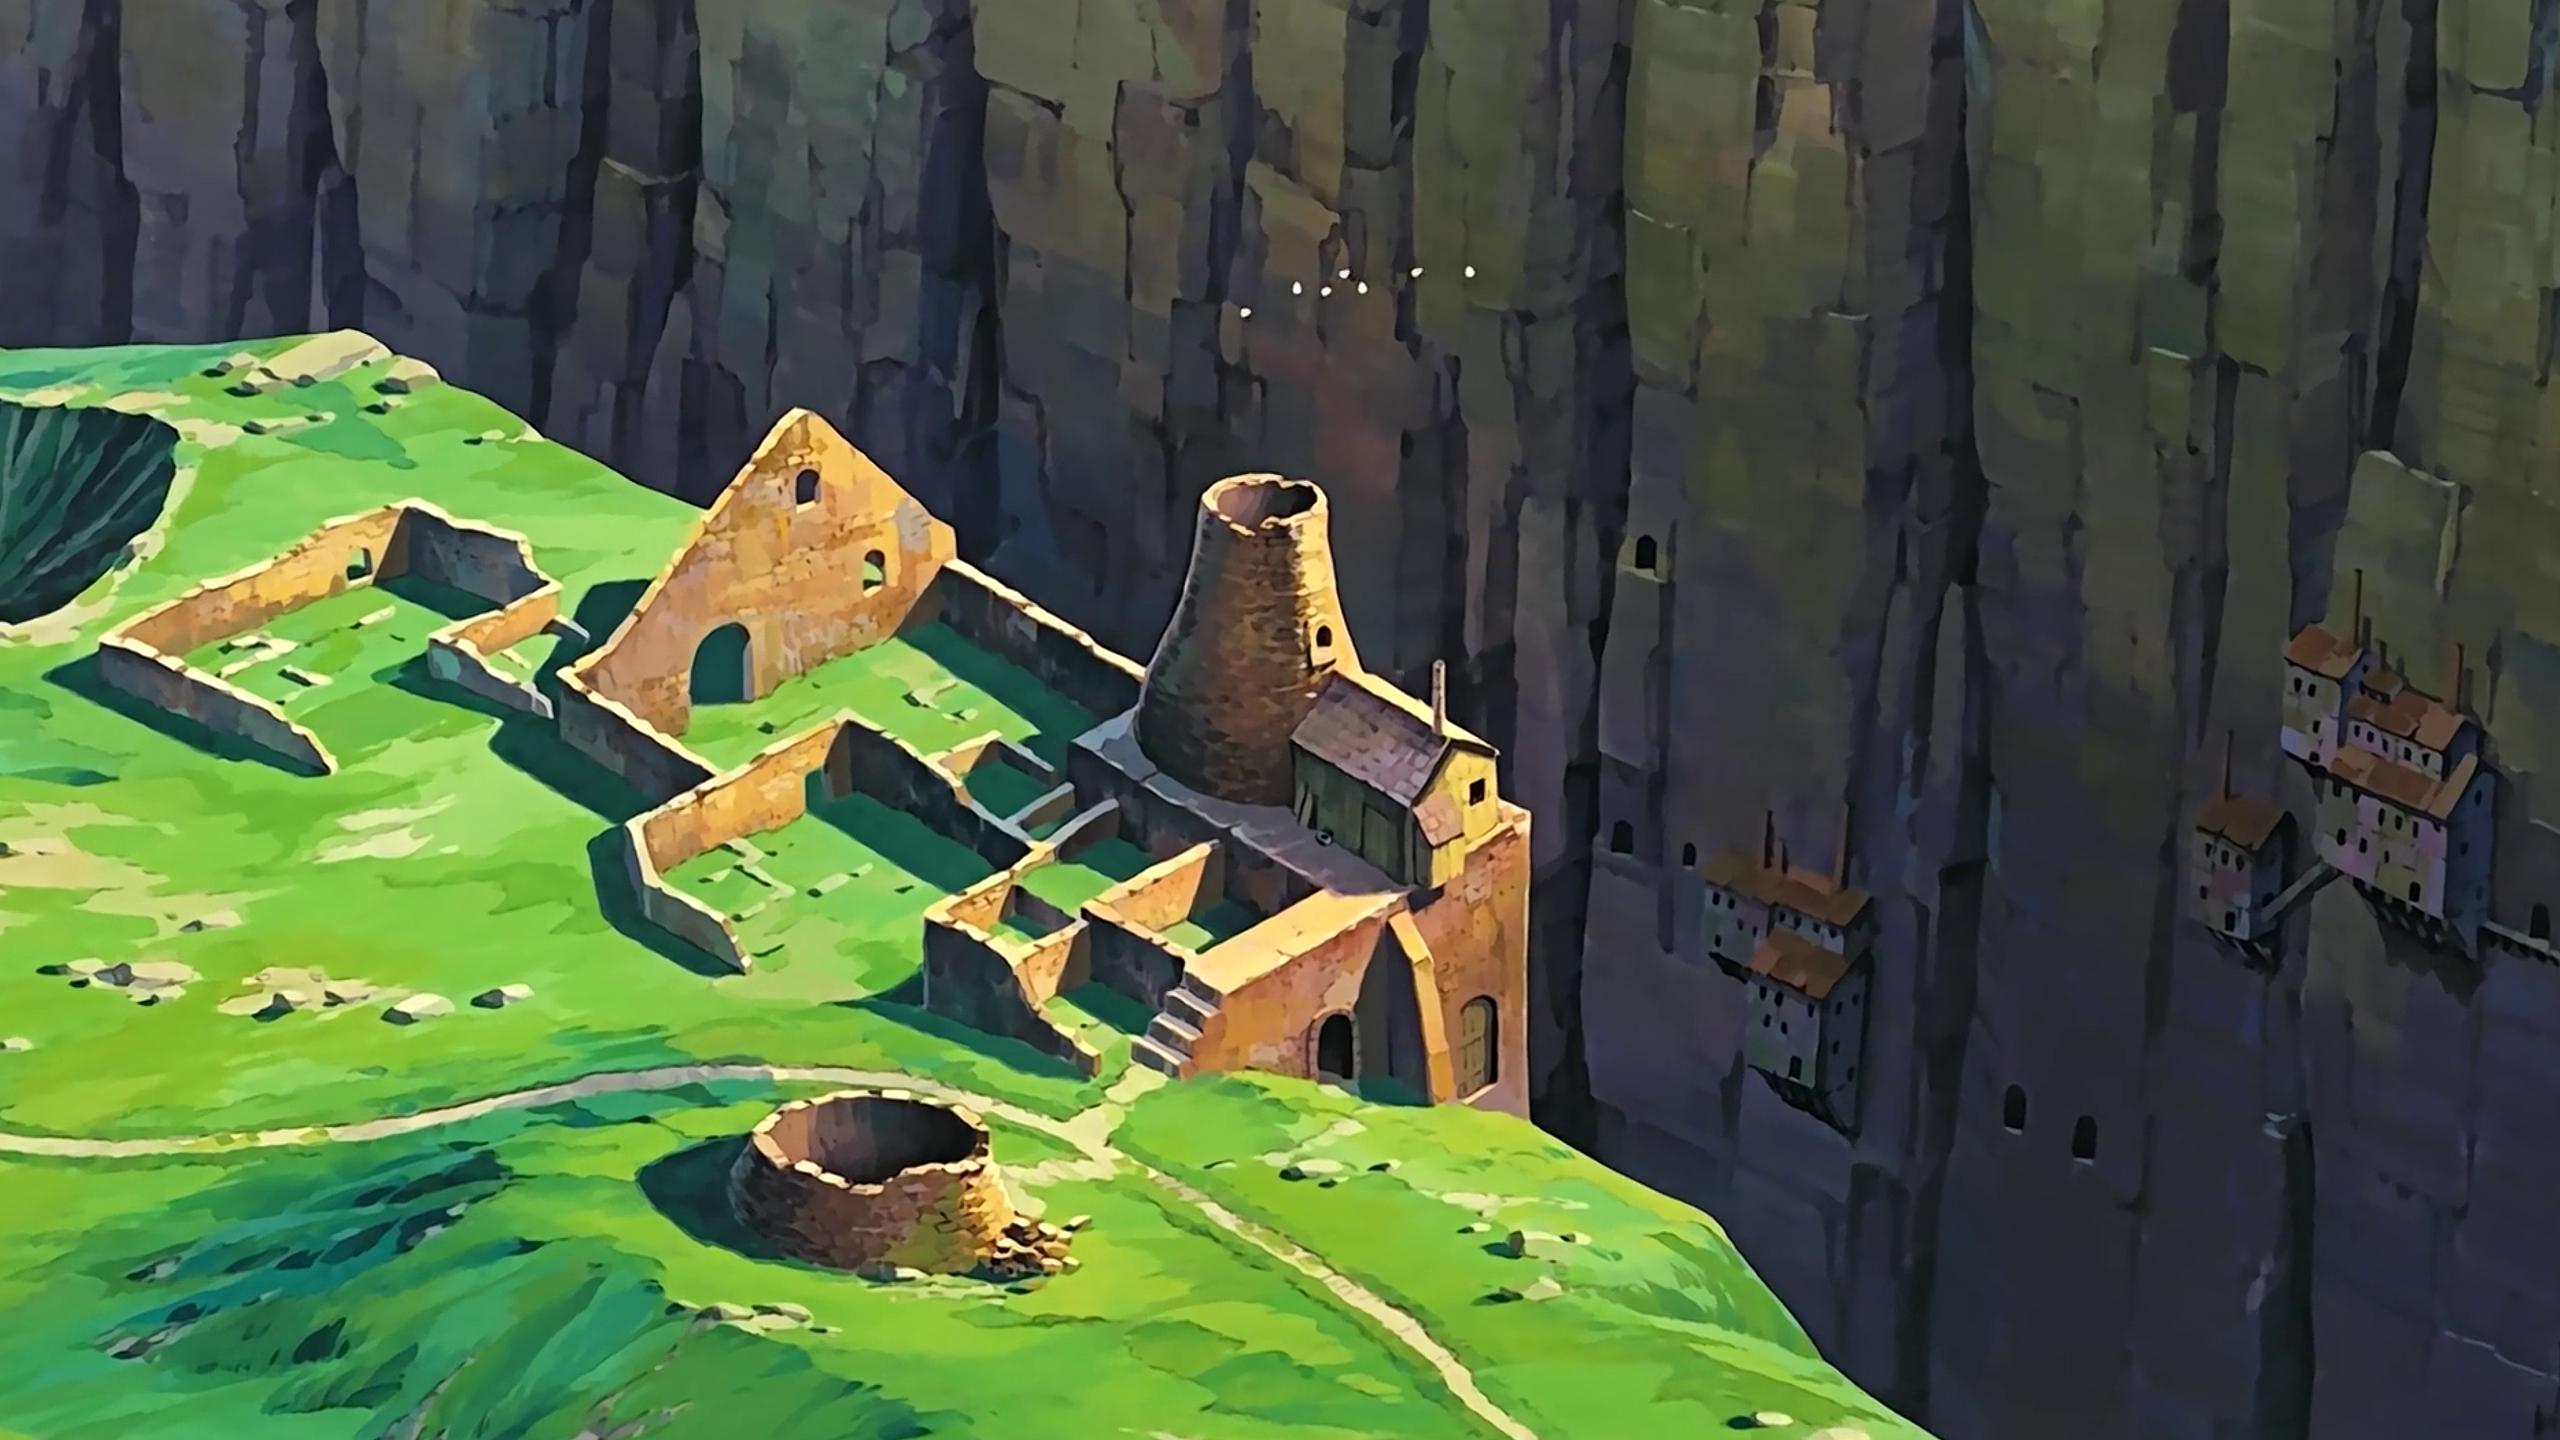 Wallpaper Studio Ghibli Anime Artwork Laputa Castle In The